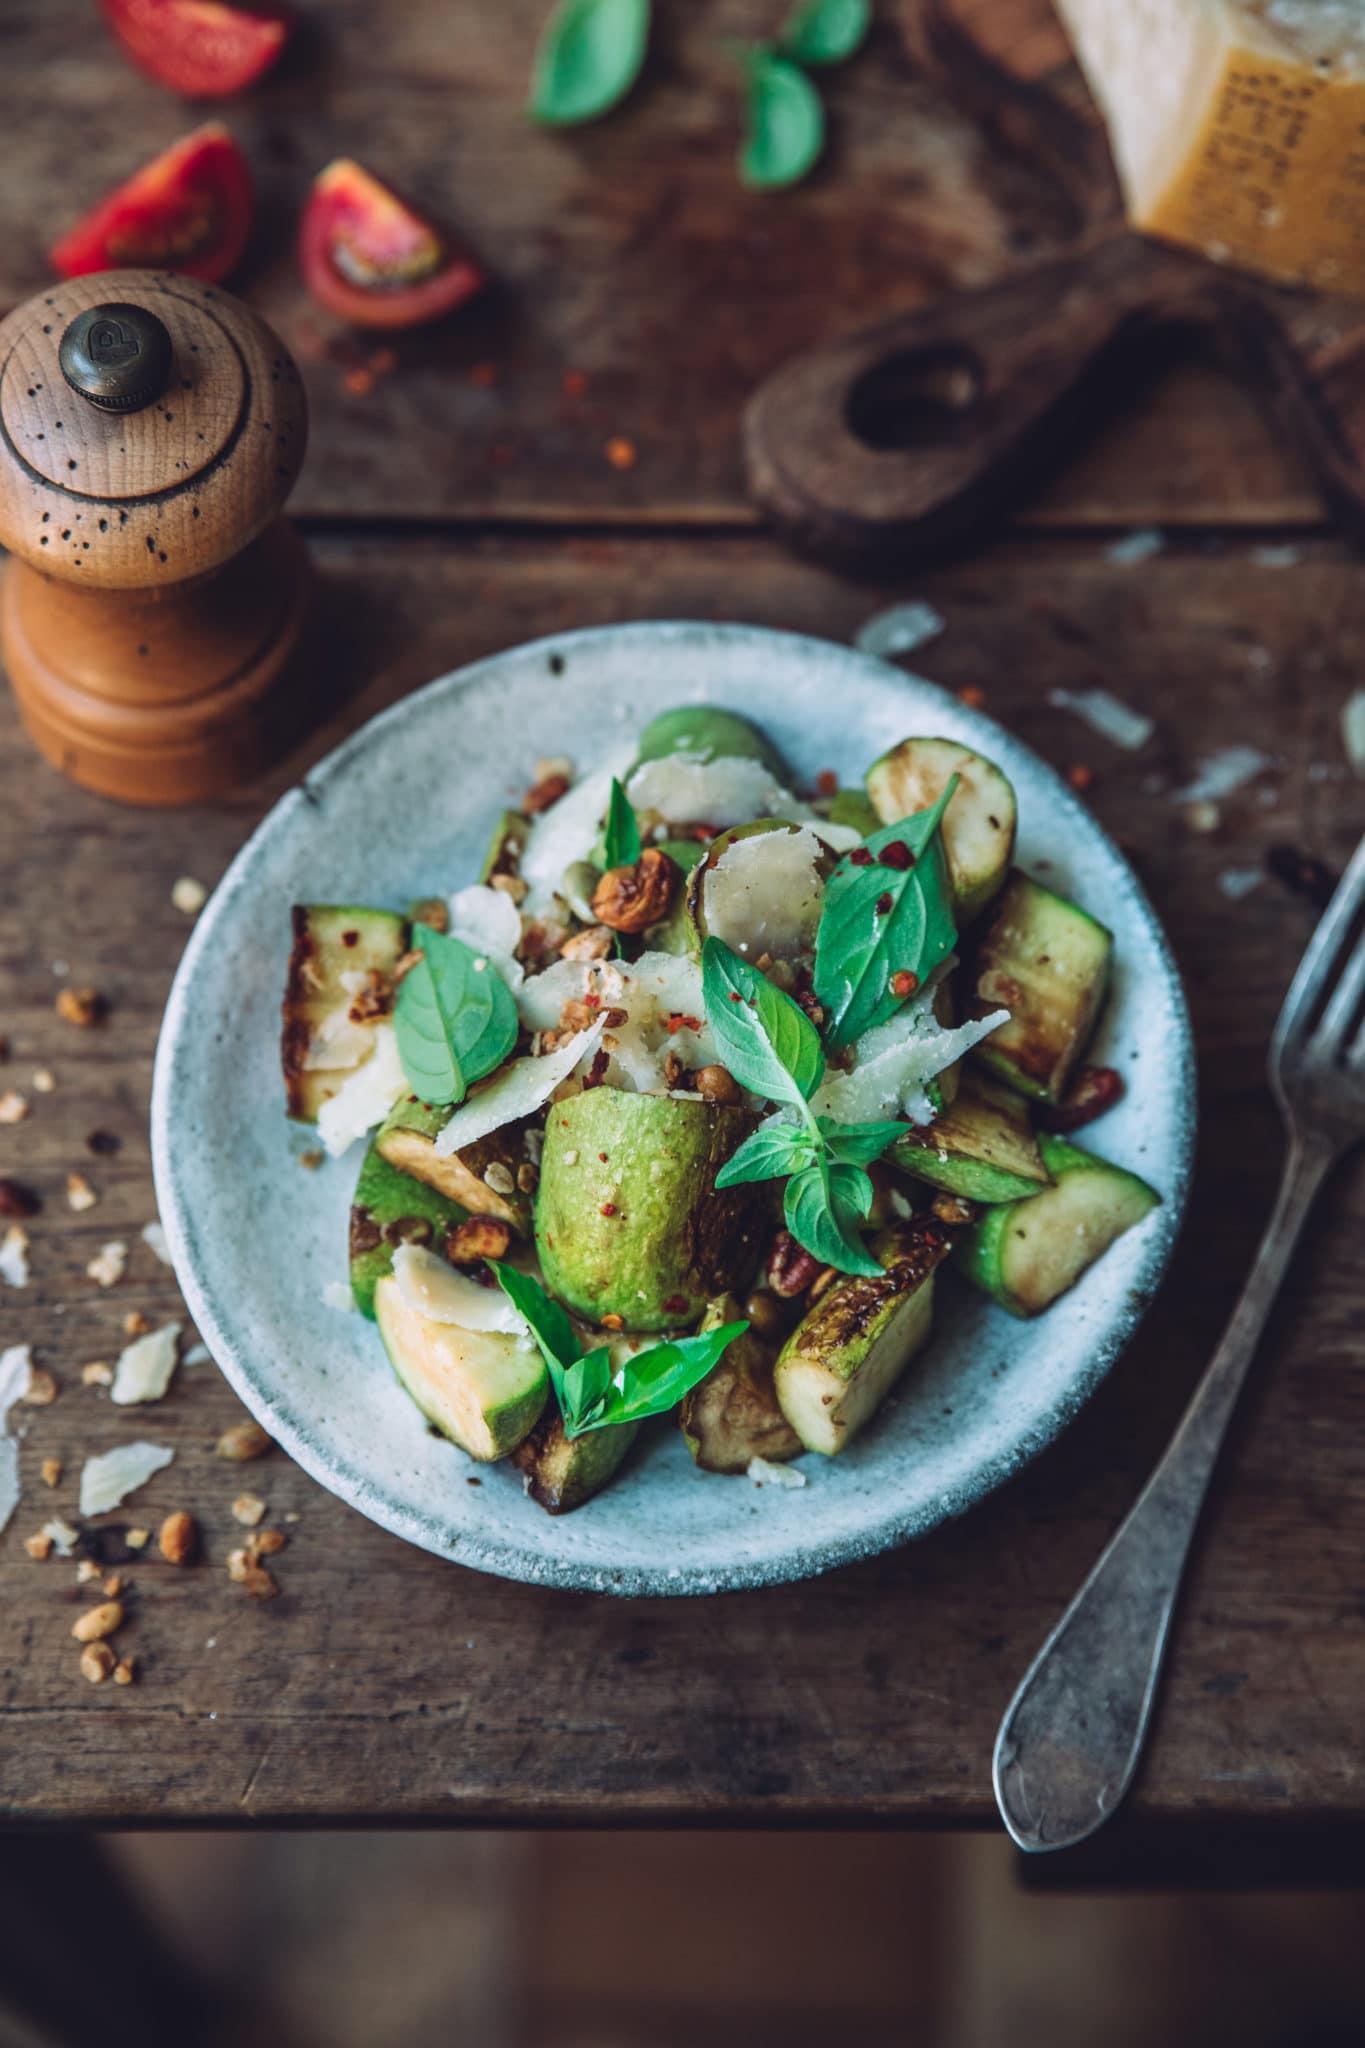 Salade courgettes grillées styliste culinaire lyon - Mégane Arderighi megandcook